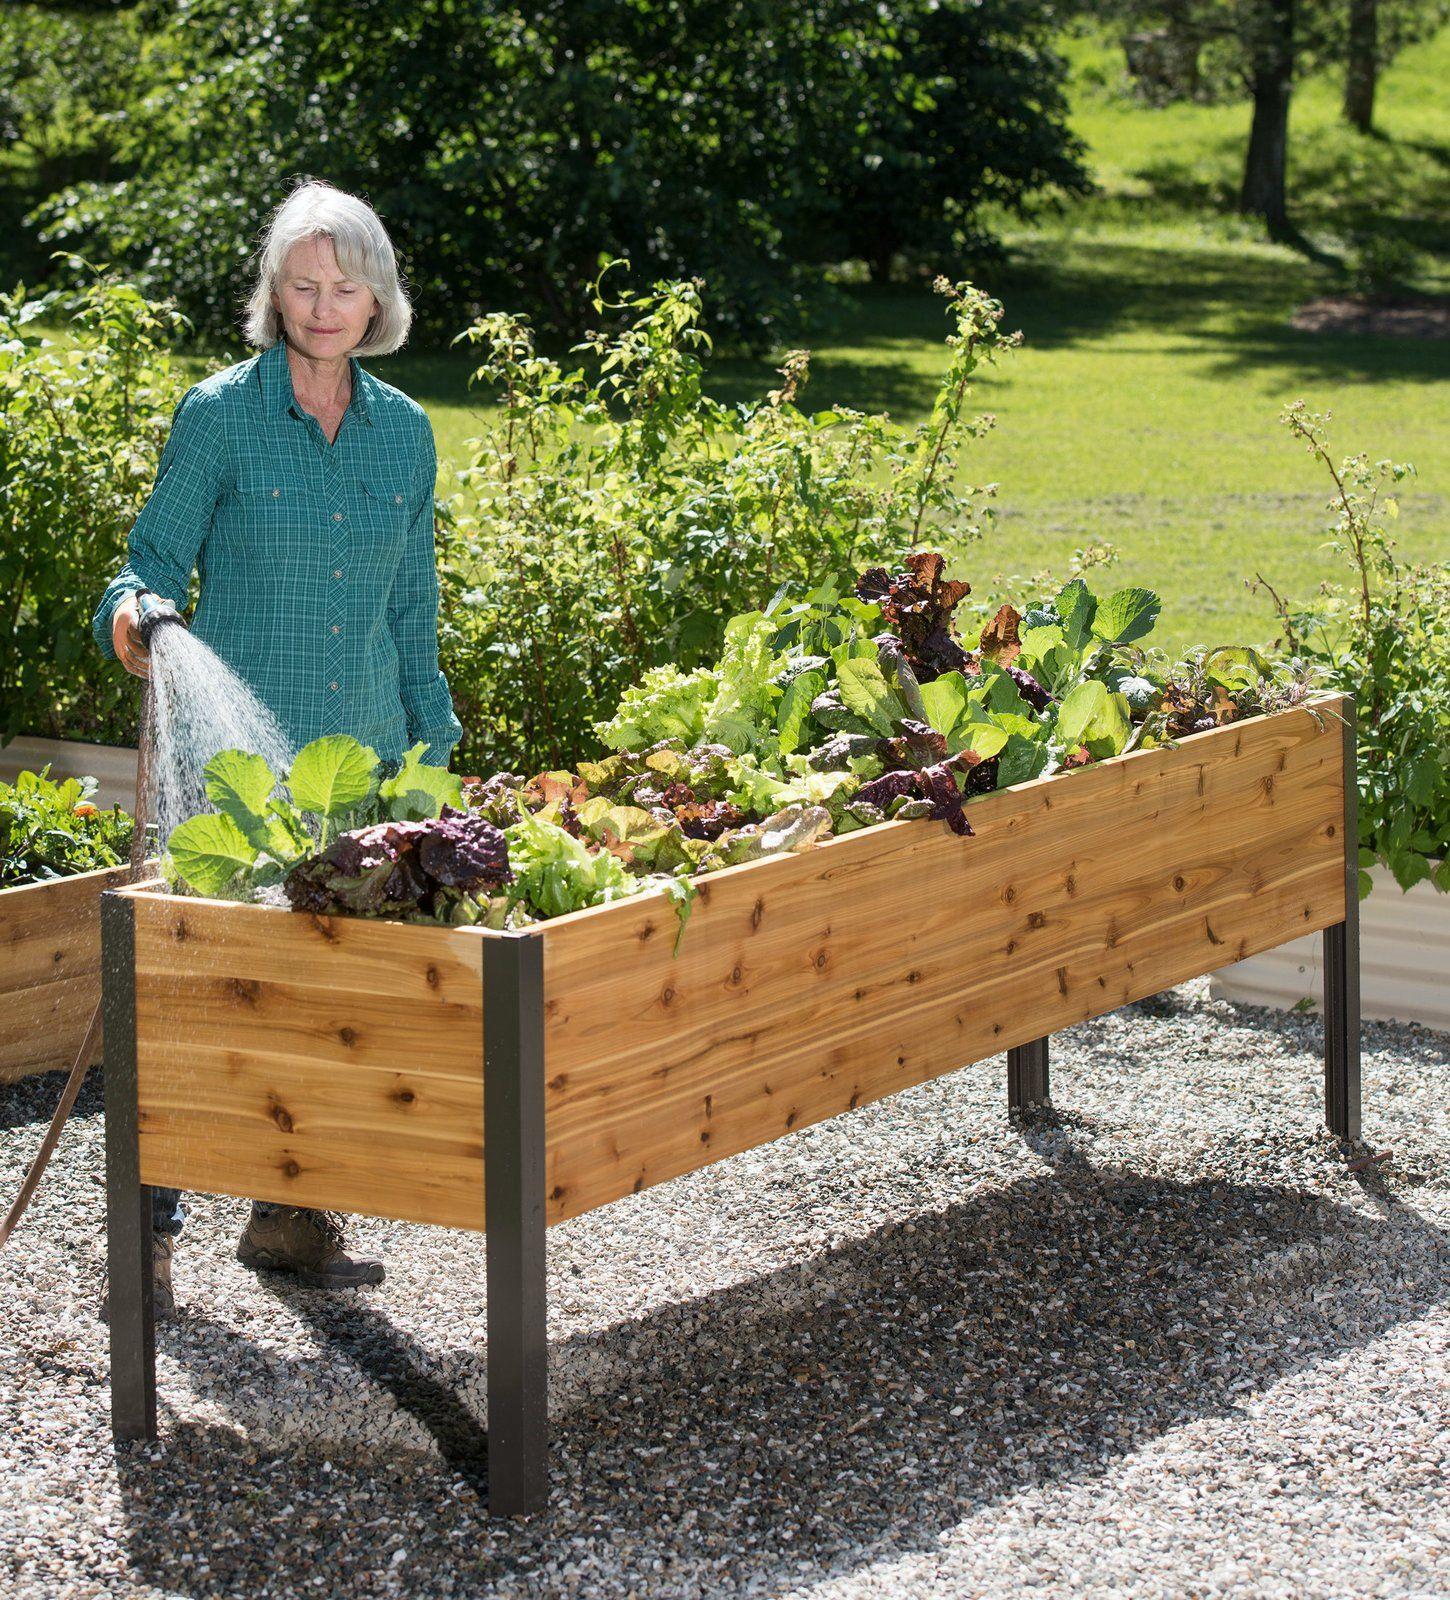 Gardener S Supply Company 2 X 8 Elevated Cedar Planter Box By